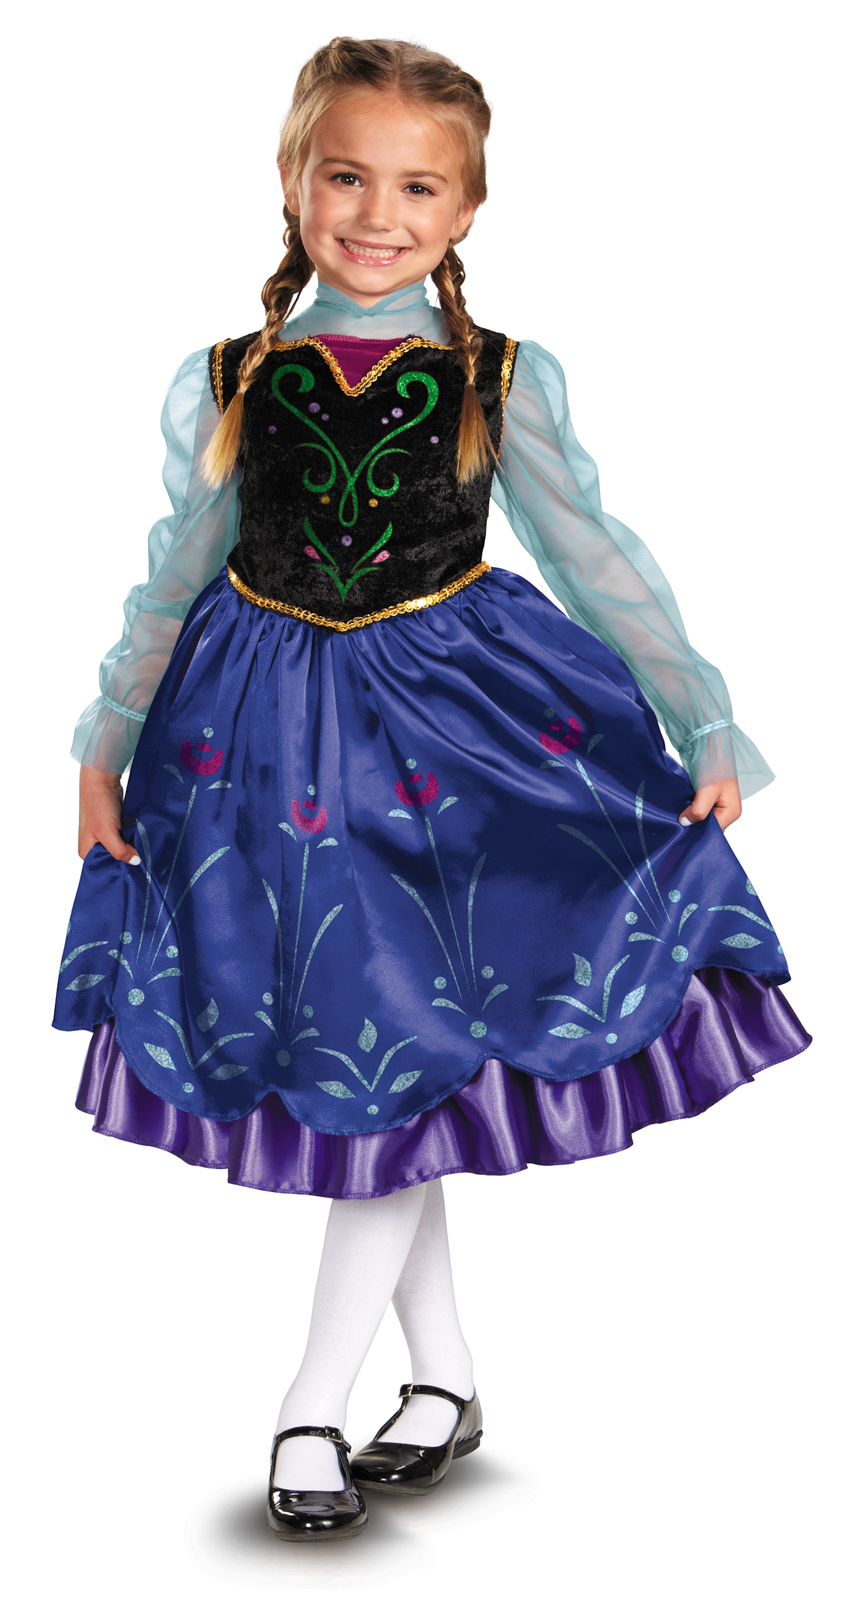 Disney Frozen Deluxe Anna Toddler / Child Costume